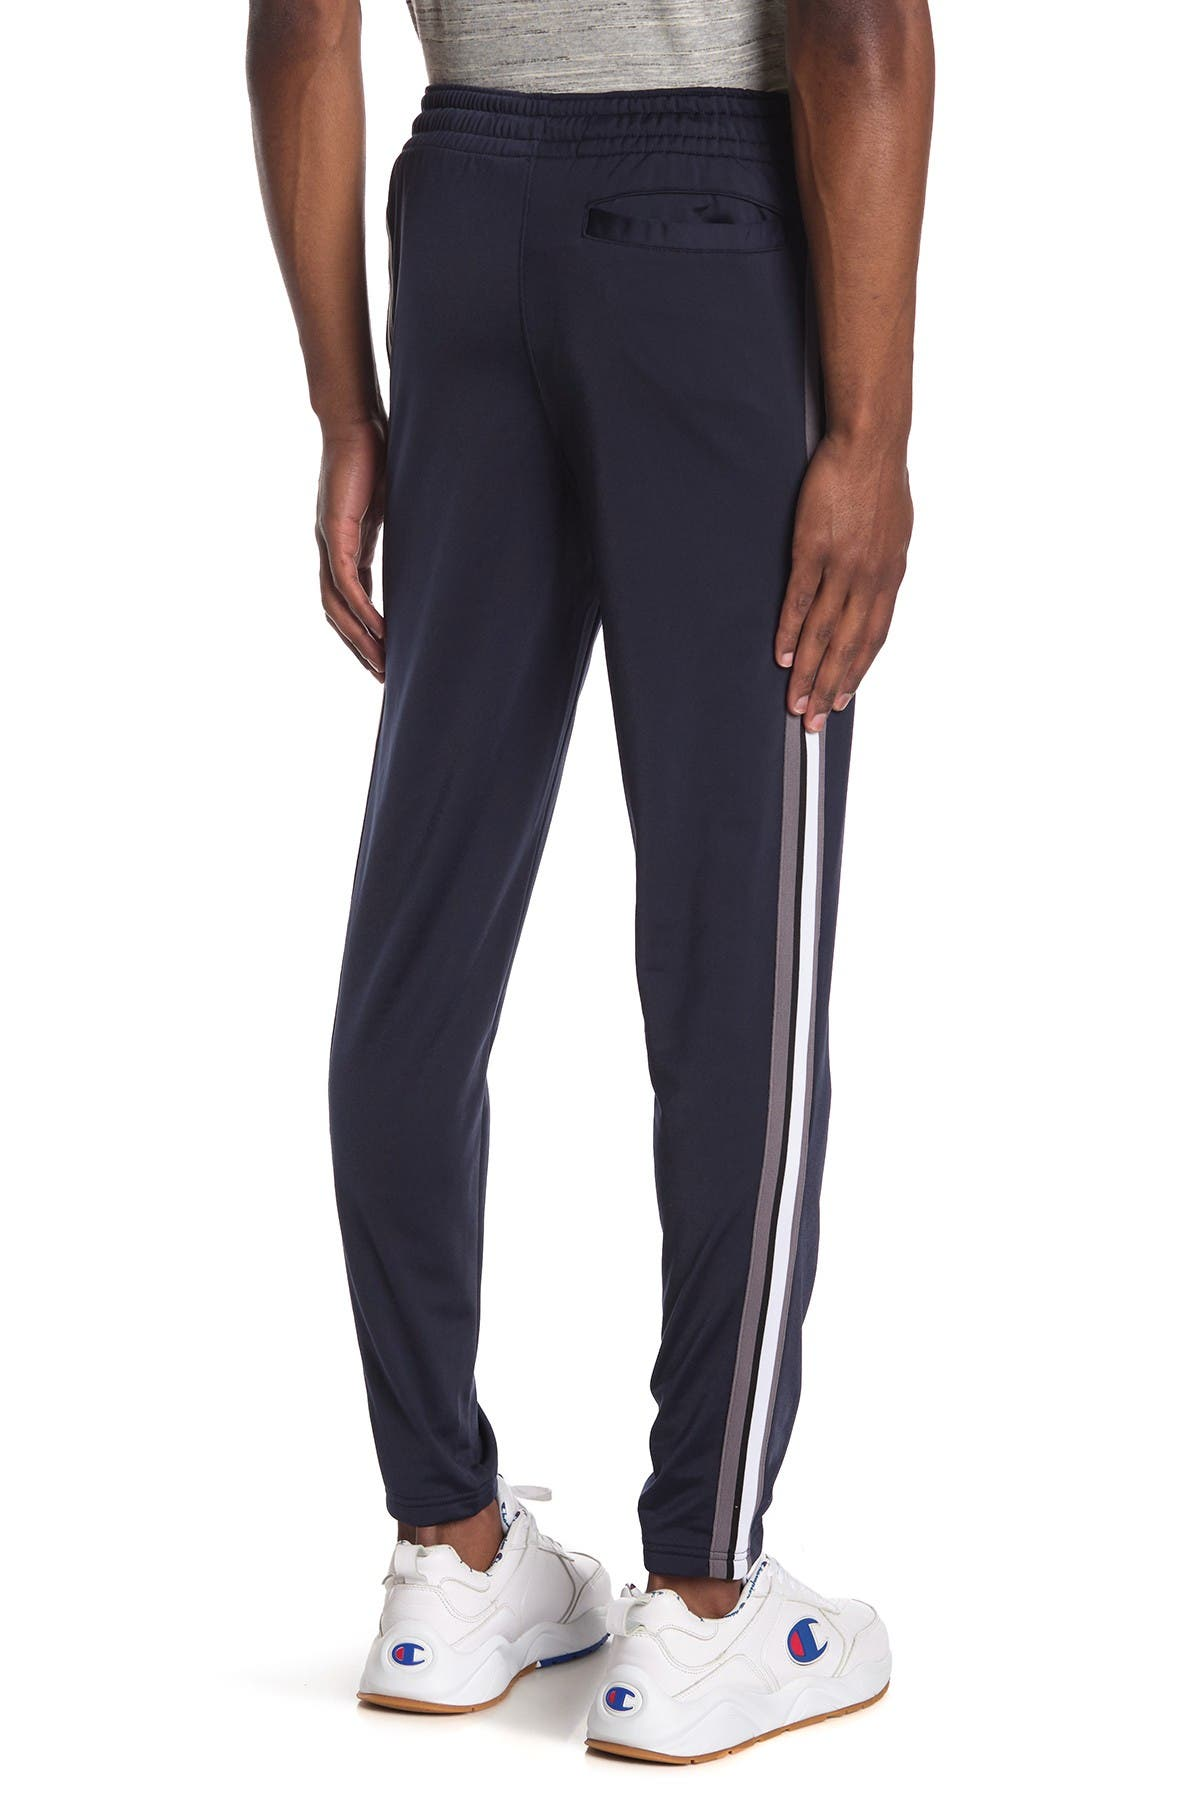 Image of Champion Side Stripe Track Pants